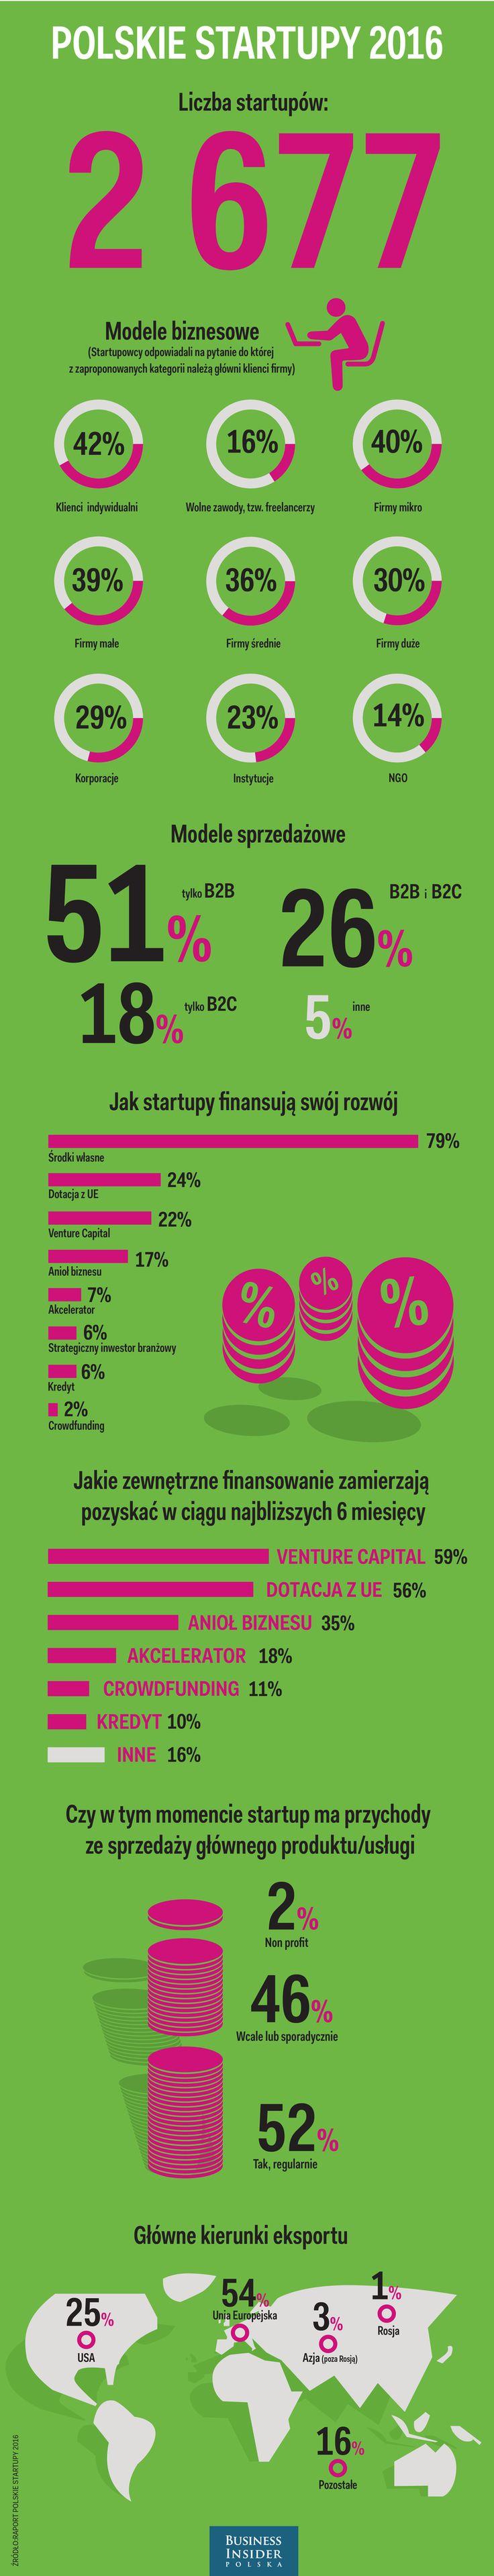 "Raport ""Polskie Startupy 2016"" Fundacji Startup Poland"